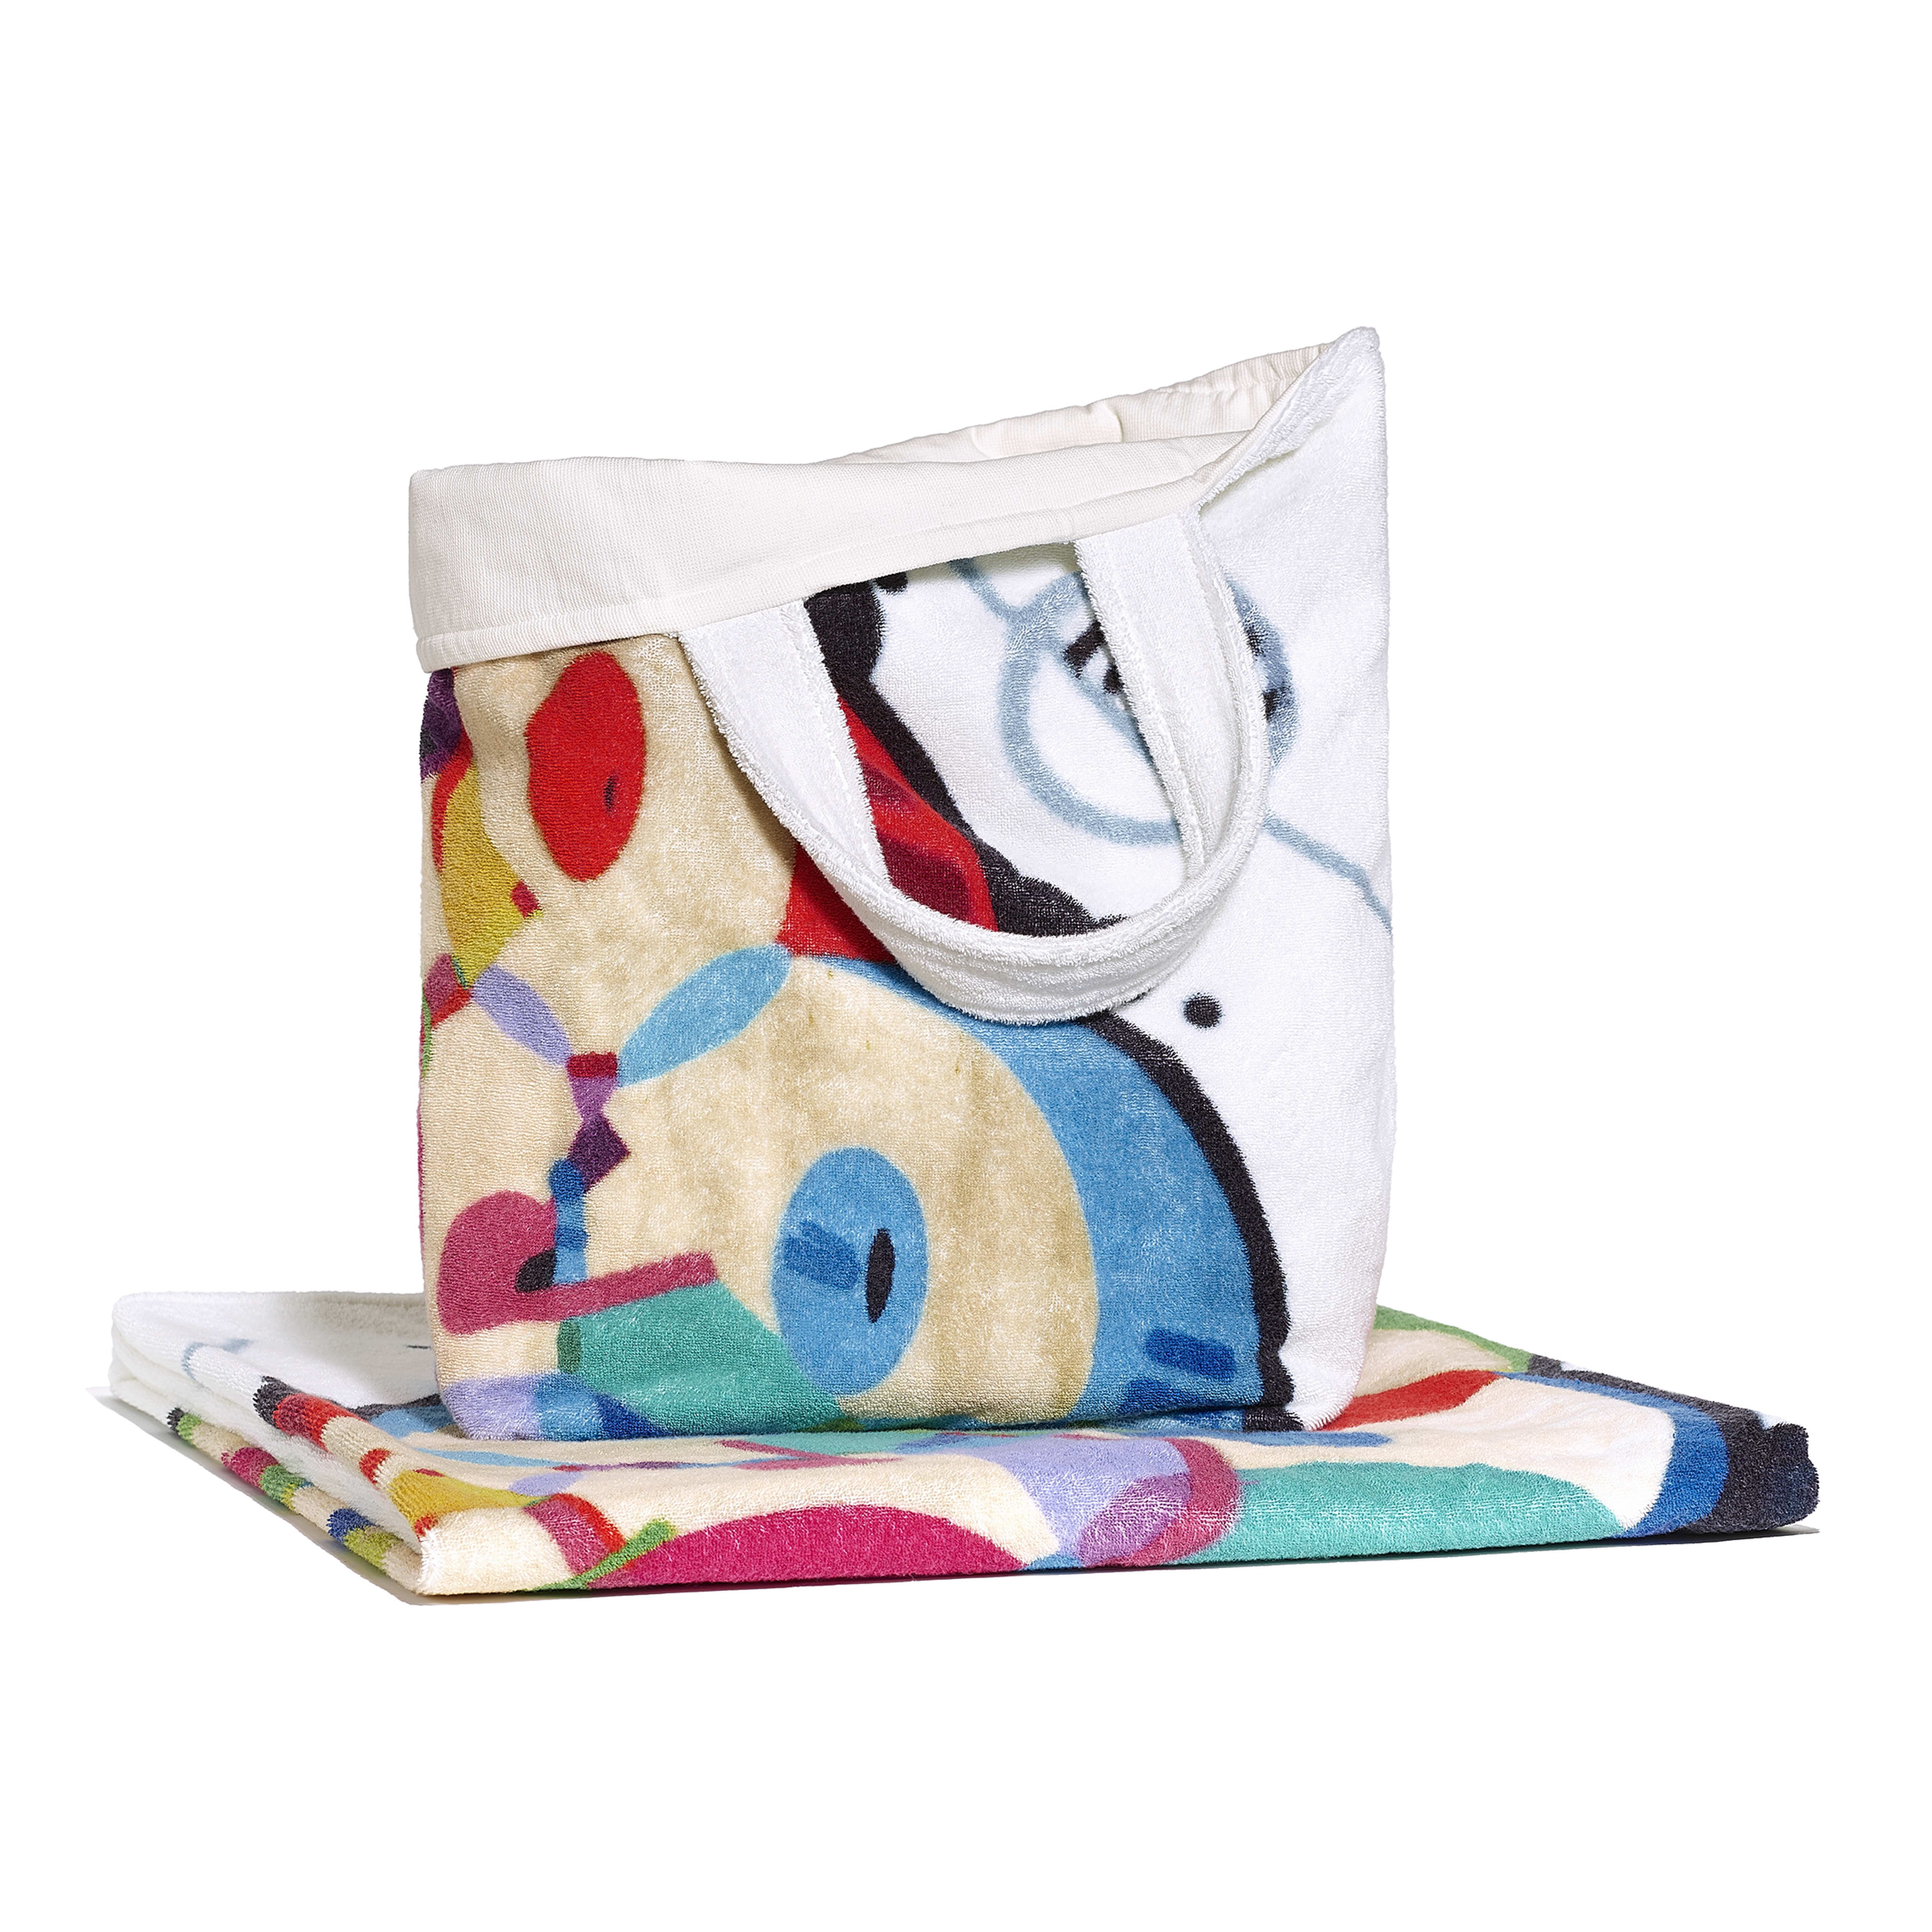 Beachwear Set - Ivory & Multicolour - Cotton - Default view - see full sized version